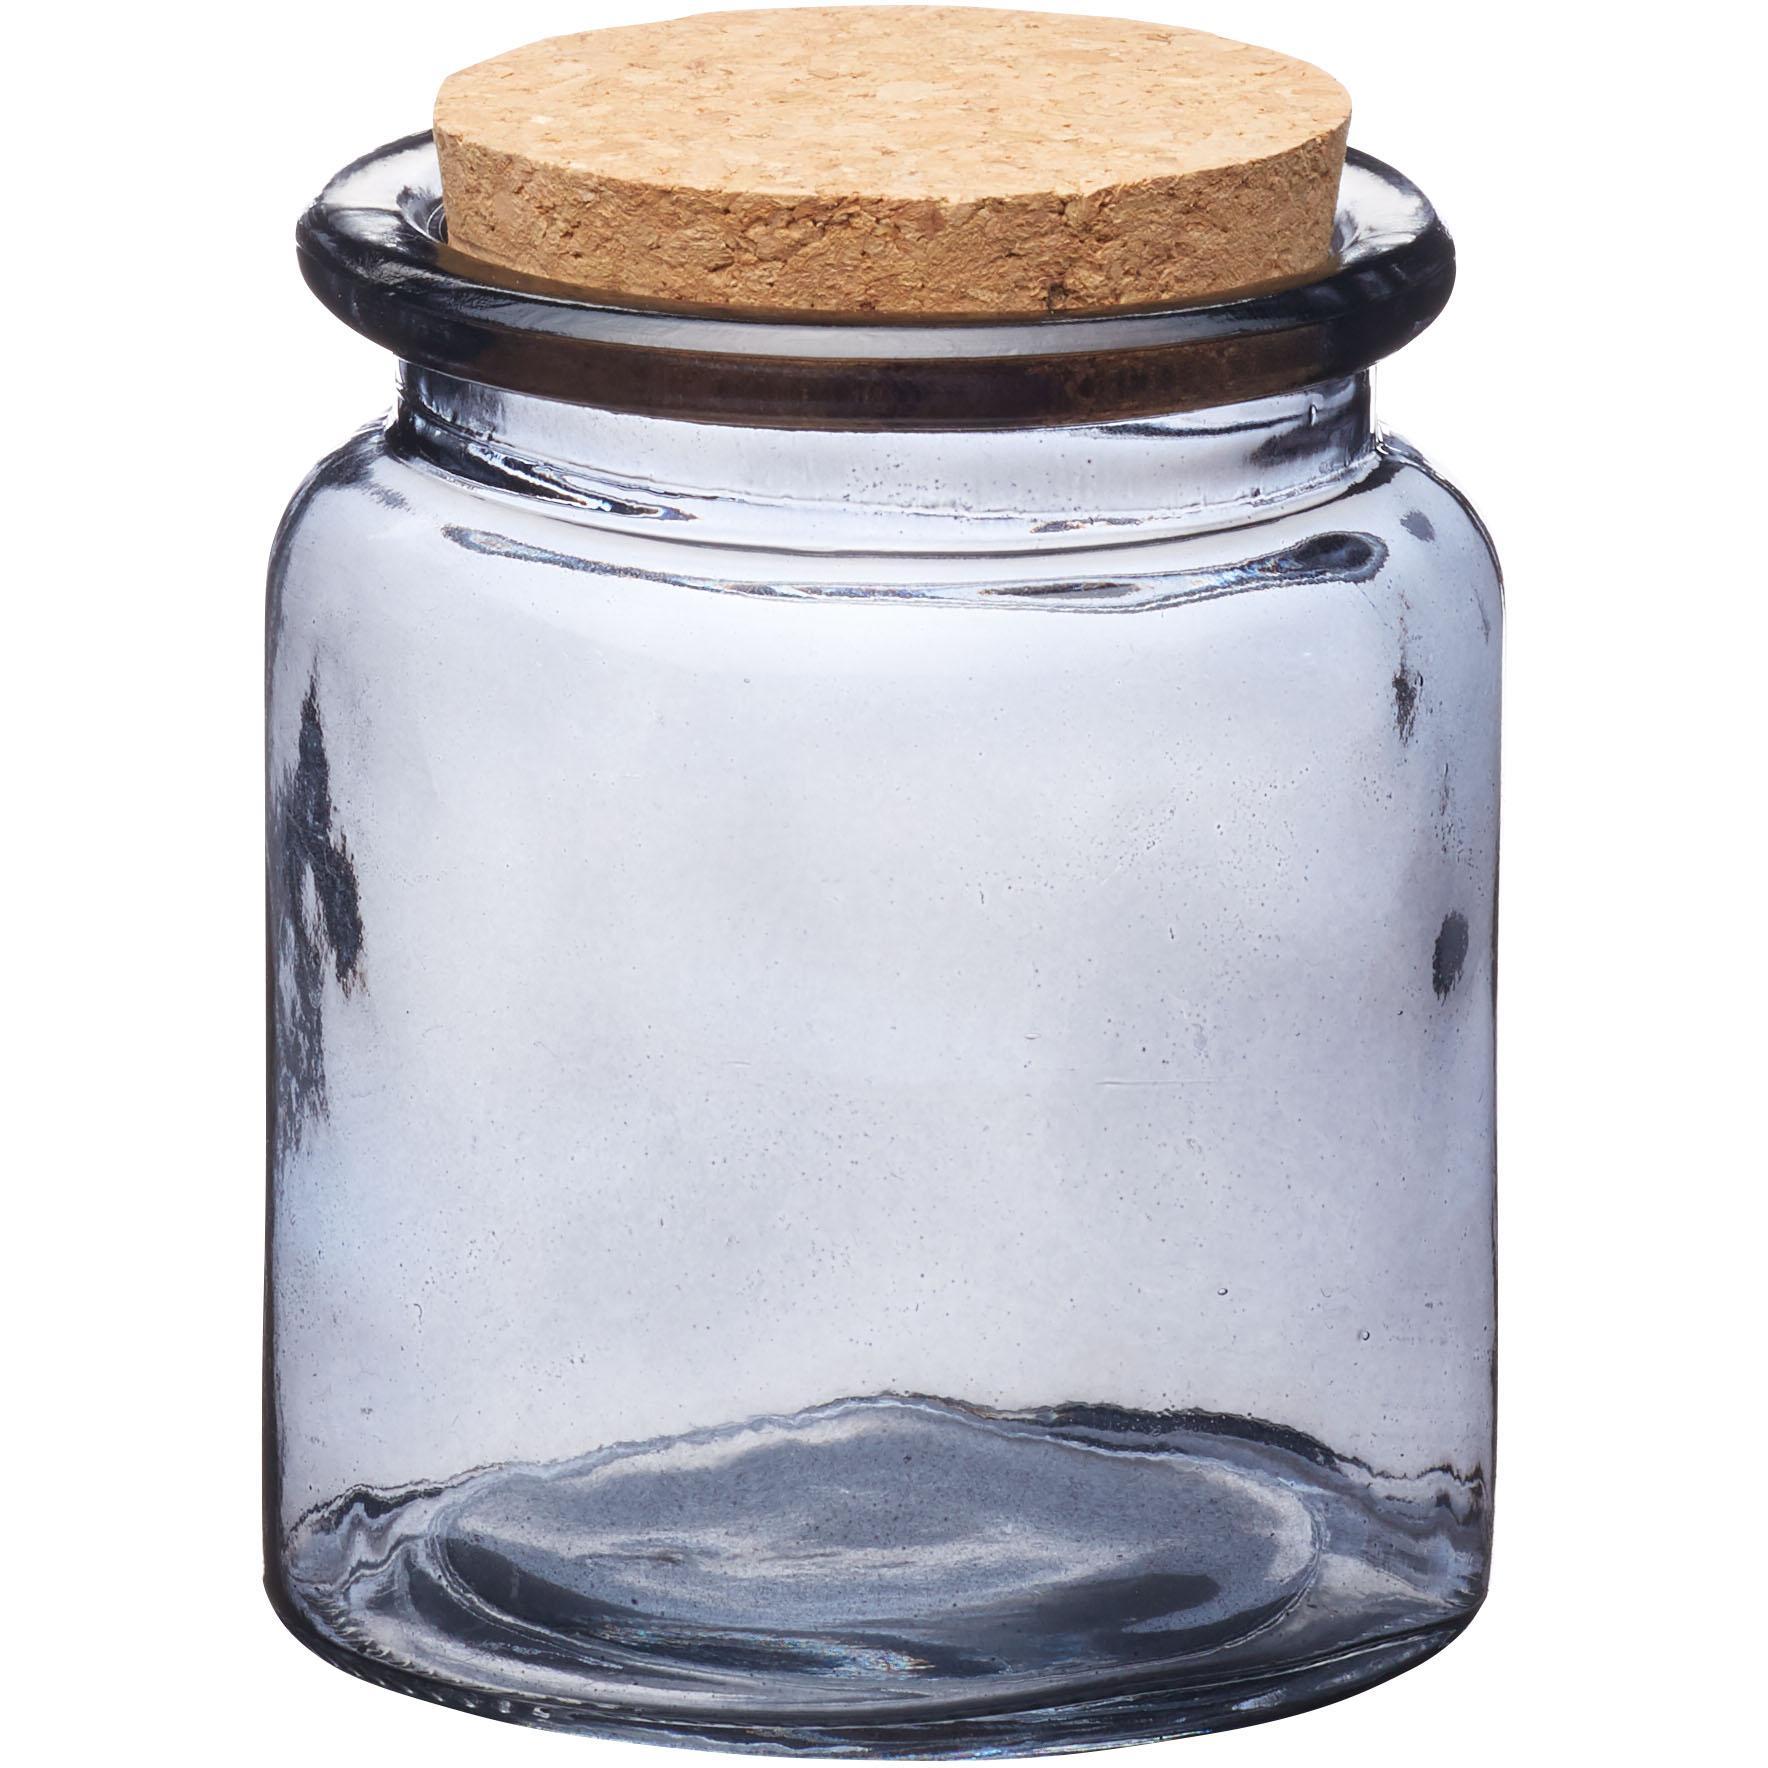 Kitchen Craft Natural Elements Small Glass Food Storage Jar 250 ml